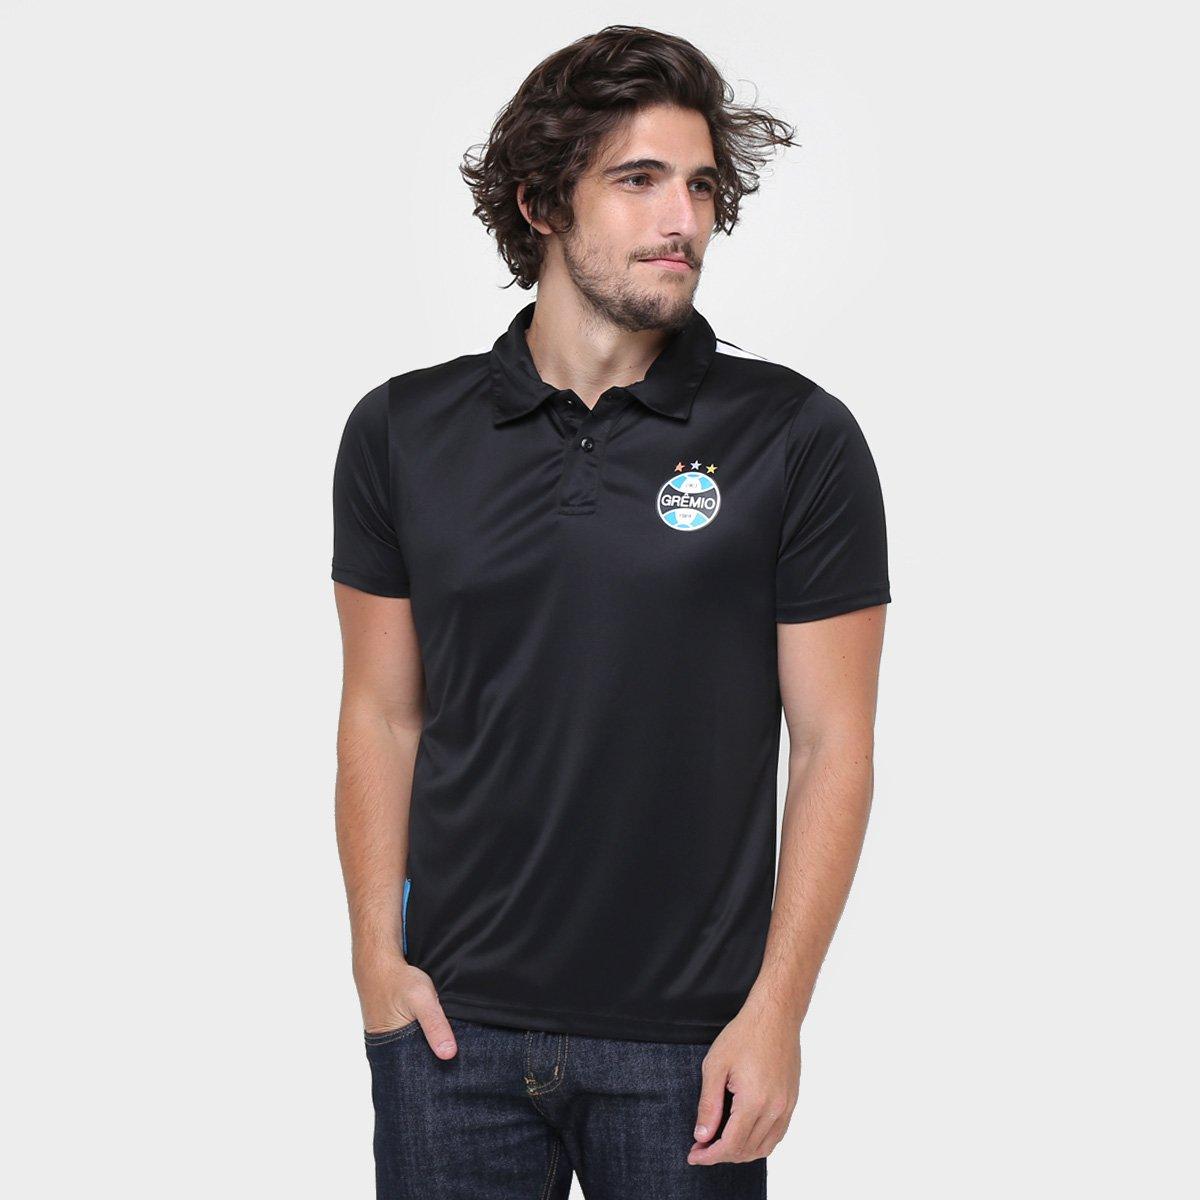 4c79fb06dd Camisa Polo Grêmio Tricolor Gaúcho Masculina - Cinza - Compre Agora ...